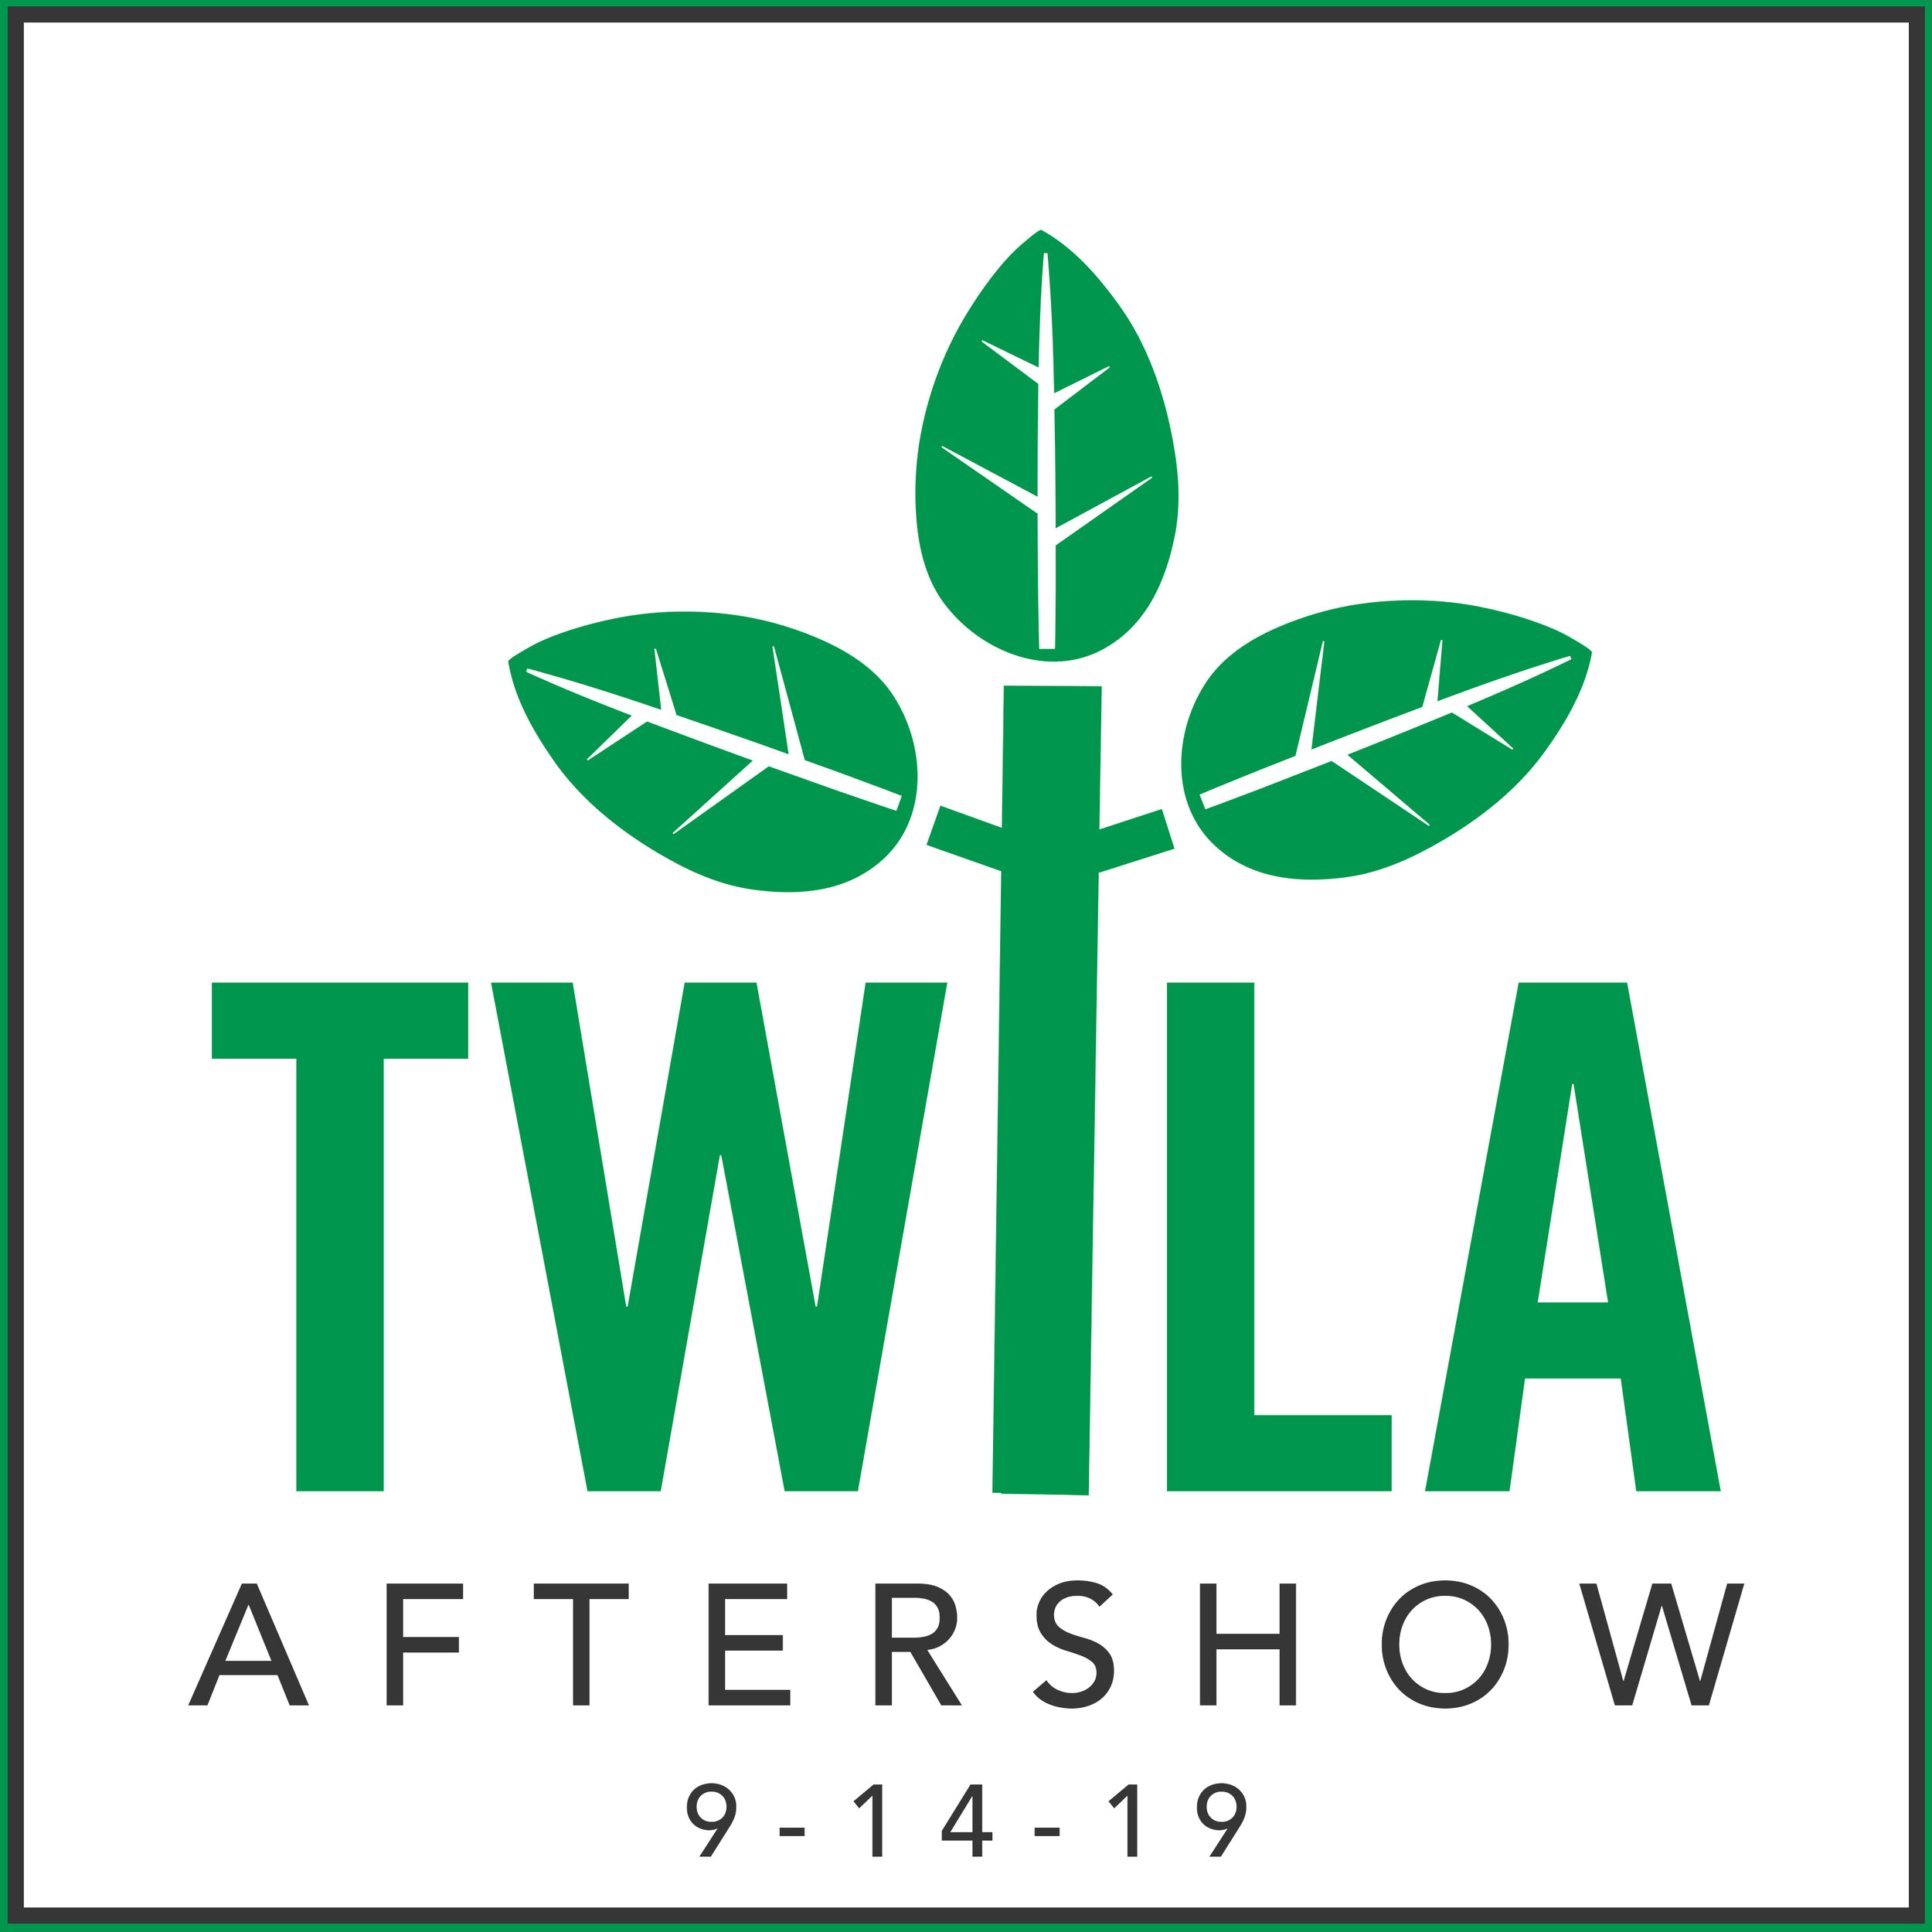 TWILA-After-Show-TN---9-14-19.jpg